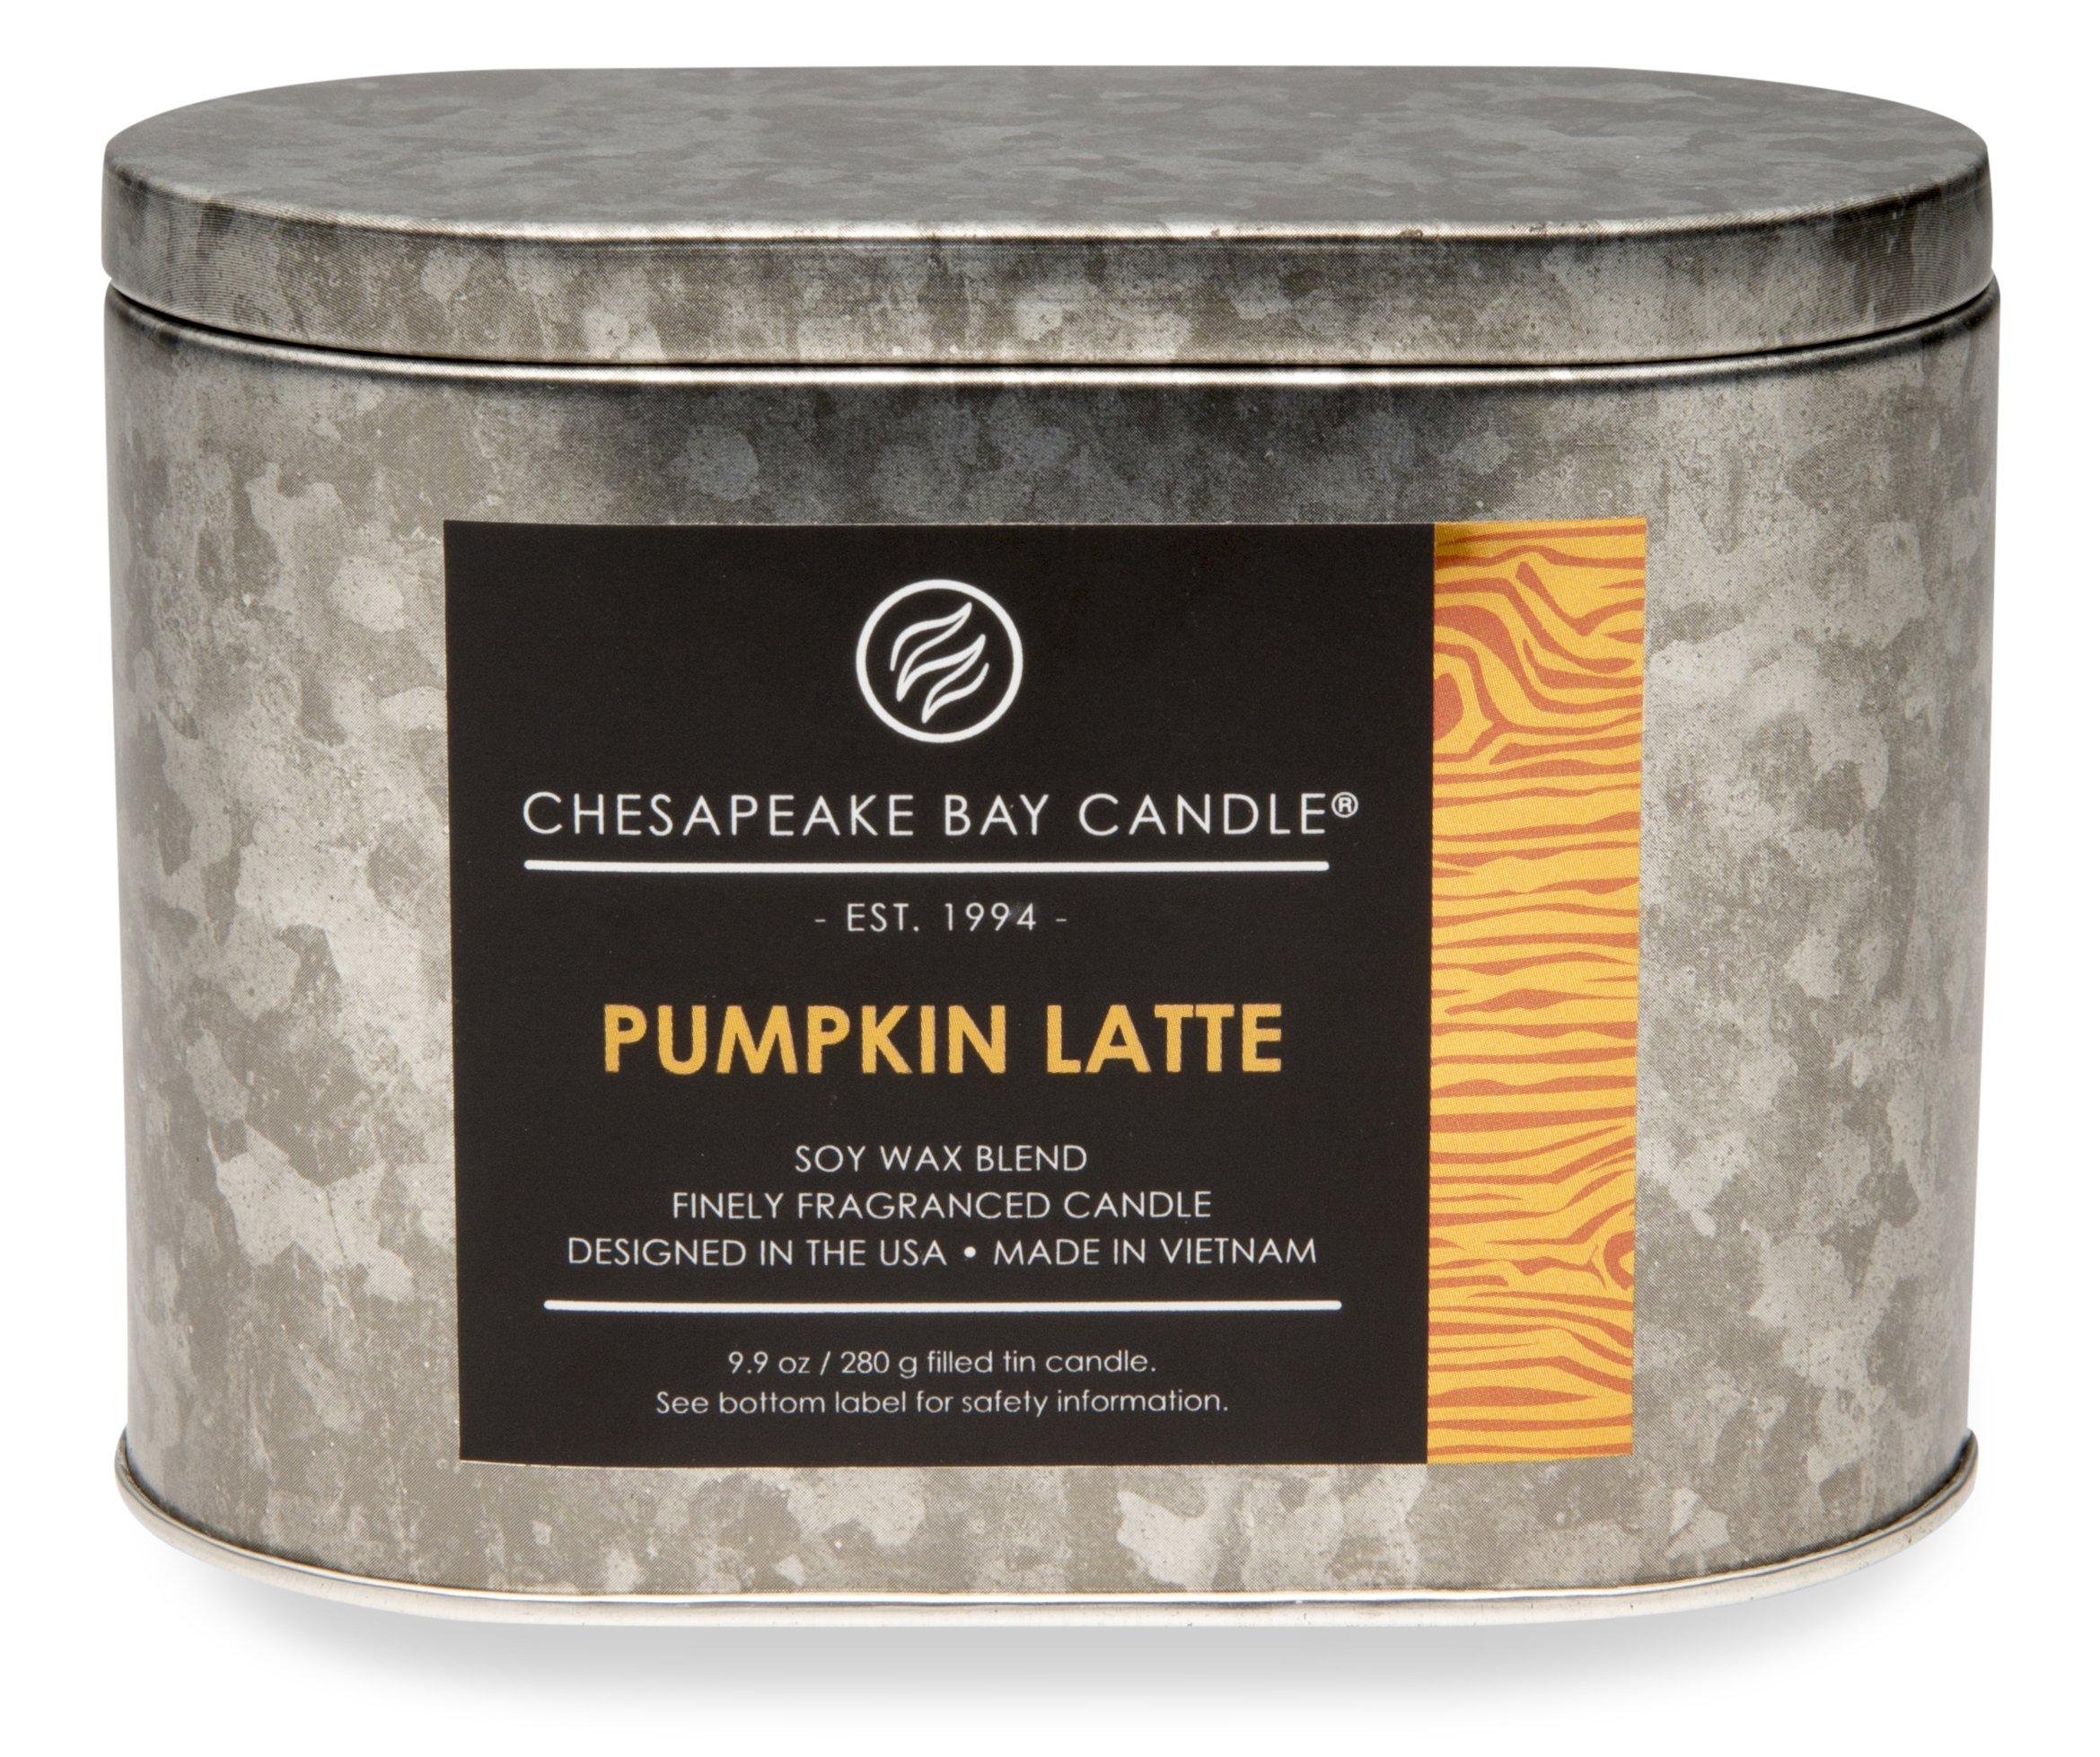 Chesapeake Bay Candle Heritage Two-Wick Tin Scented Candle, Pumpkin Latte by Chesapeake Bay Candle